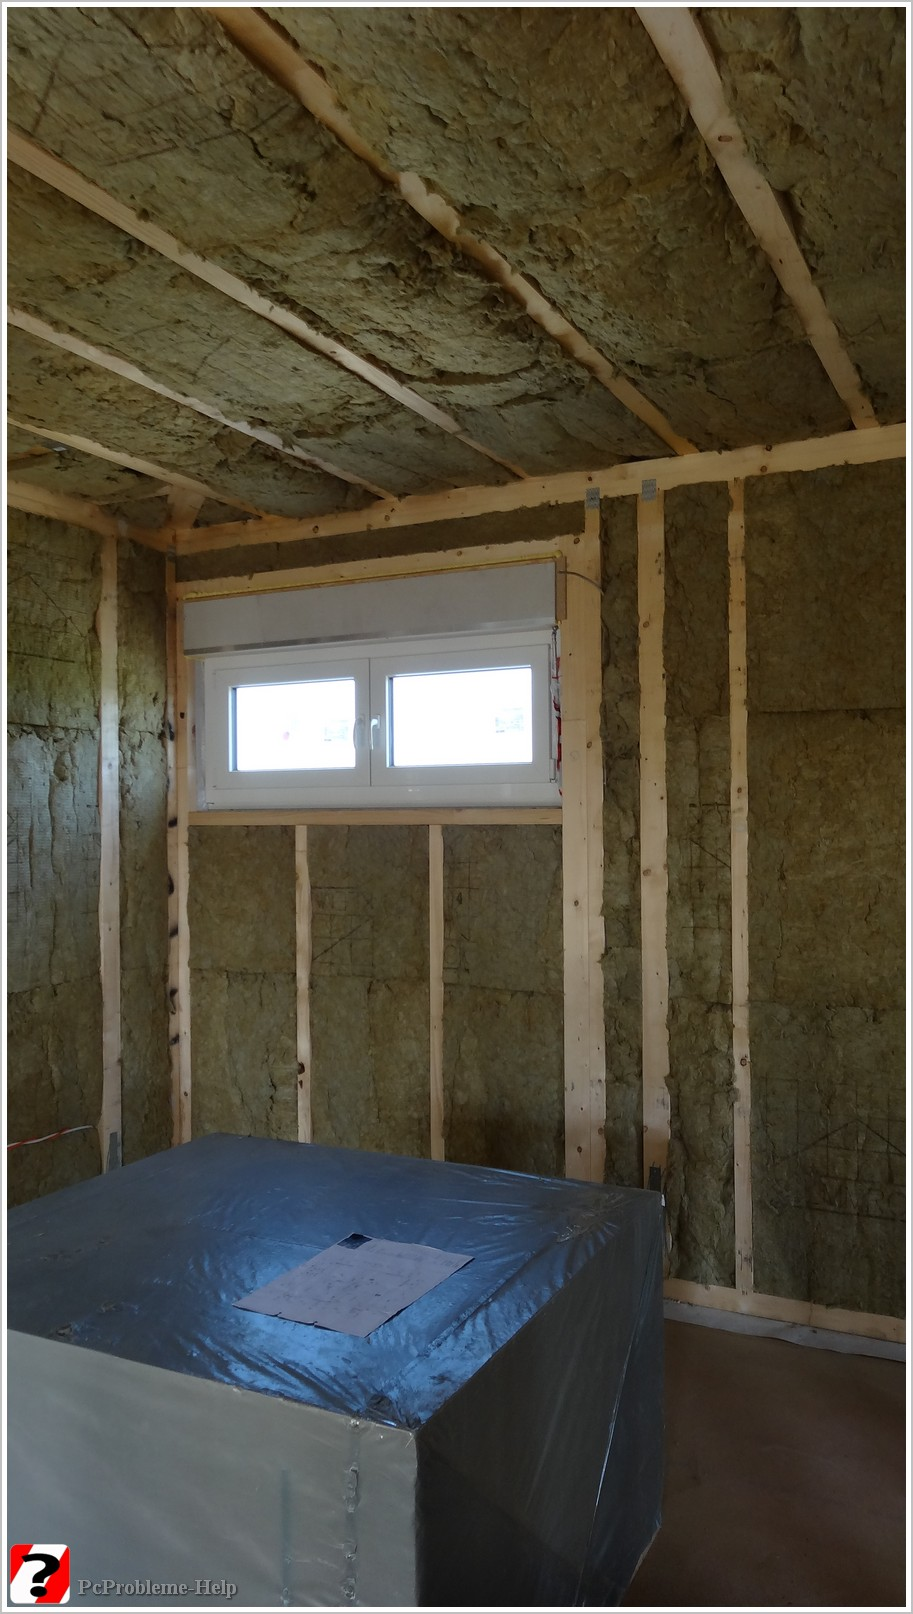 diy home hausbau projekt 14 mit sascha und petra page 9 projekte we mod it das forum. Black Bedroom Furniture Sets. Home Design Ideas